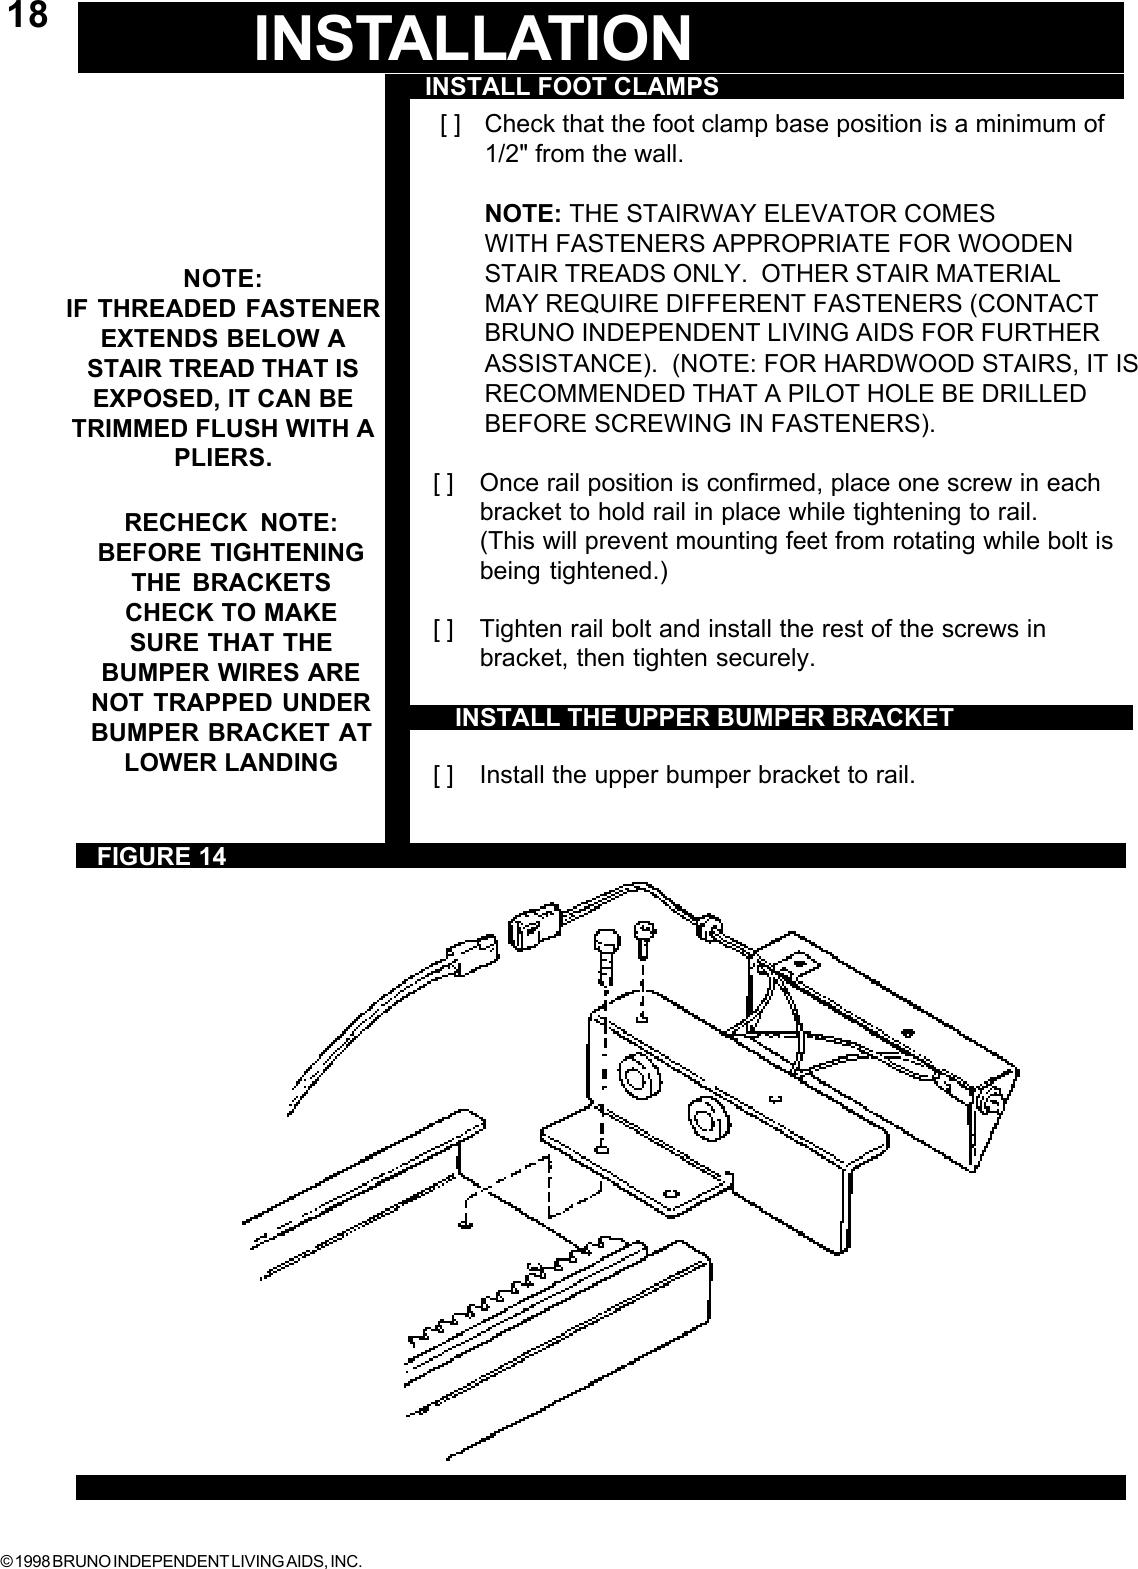 chair lift wiring schematic mm 8868  stannah stair lift wiring diagram patent us4904916  stannah stair lift wiring diagram